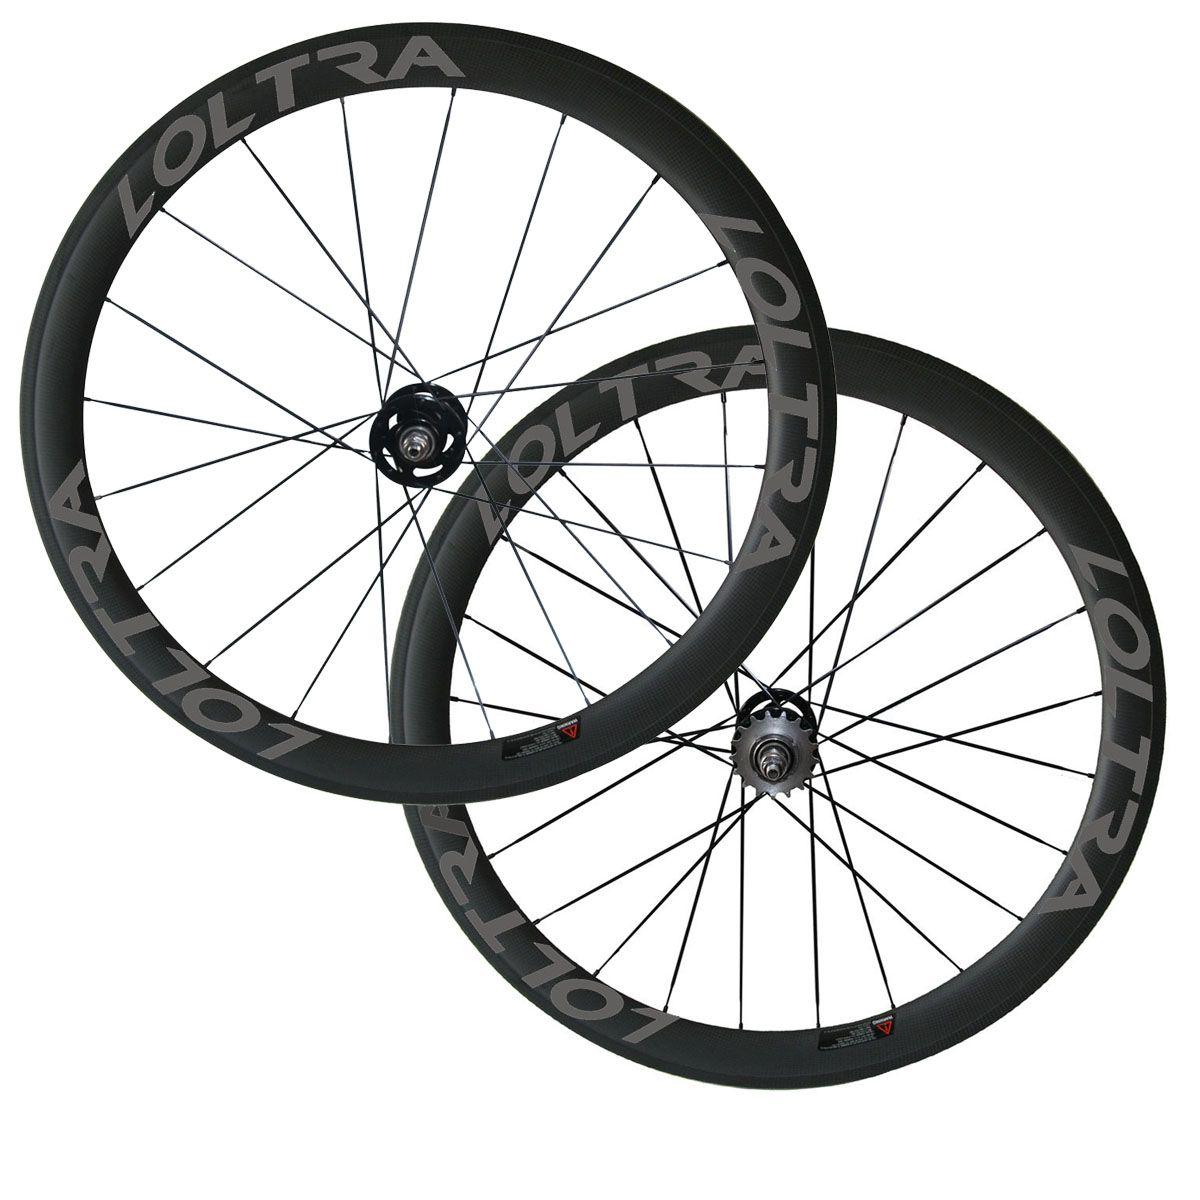 Free Shipping 50mm Clincher/Tubular R=Track Bike Wheelset LOLTRA White Decal Fix Gear Wheels A165SB/A166SB Track Bicycle